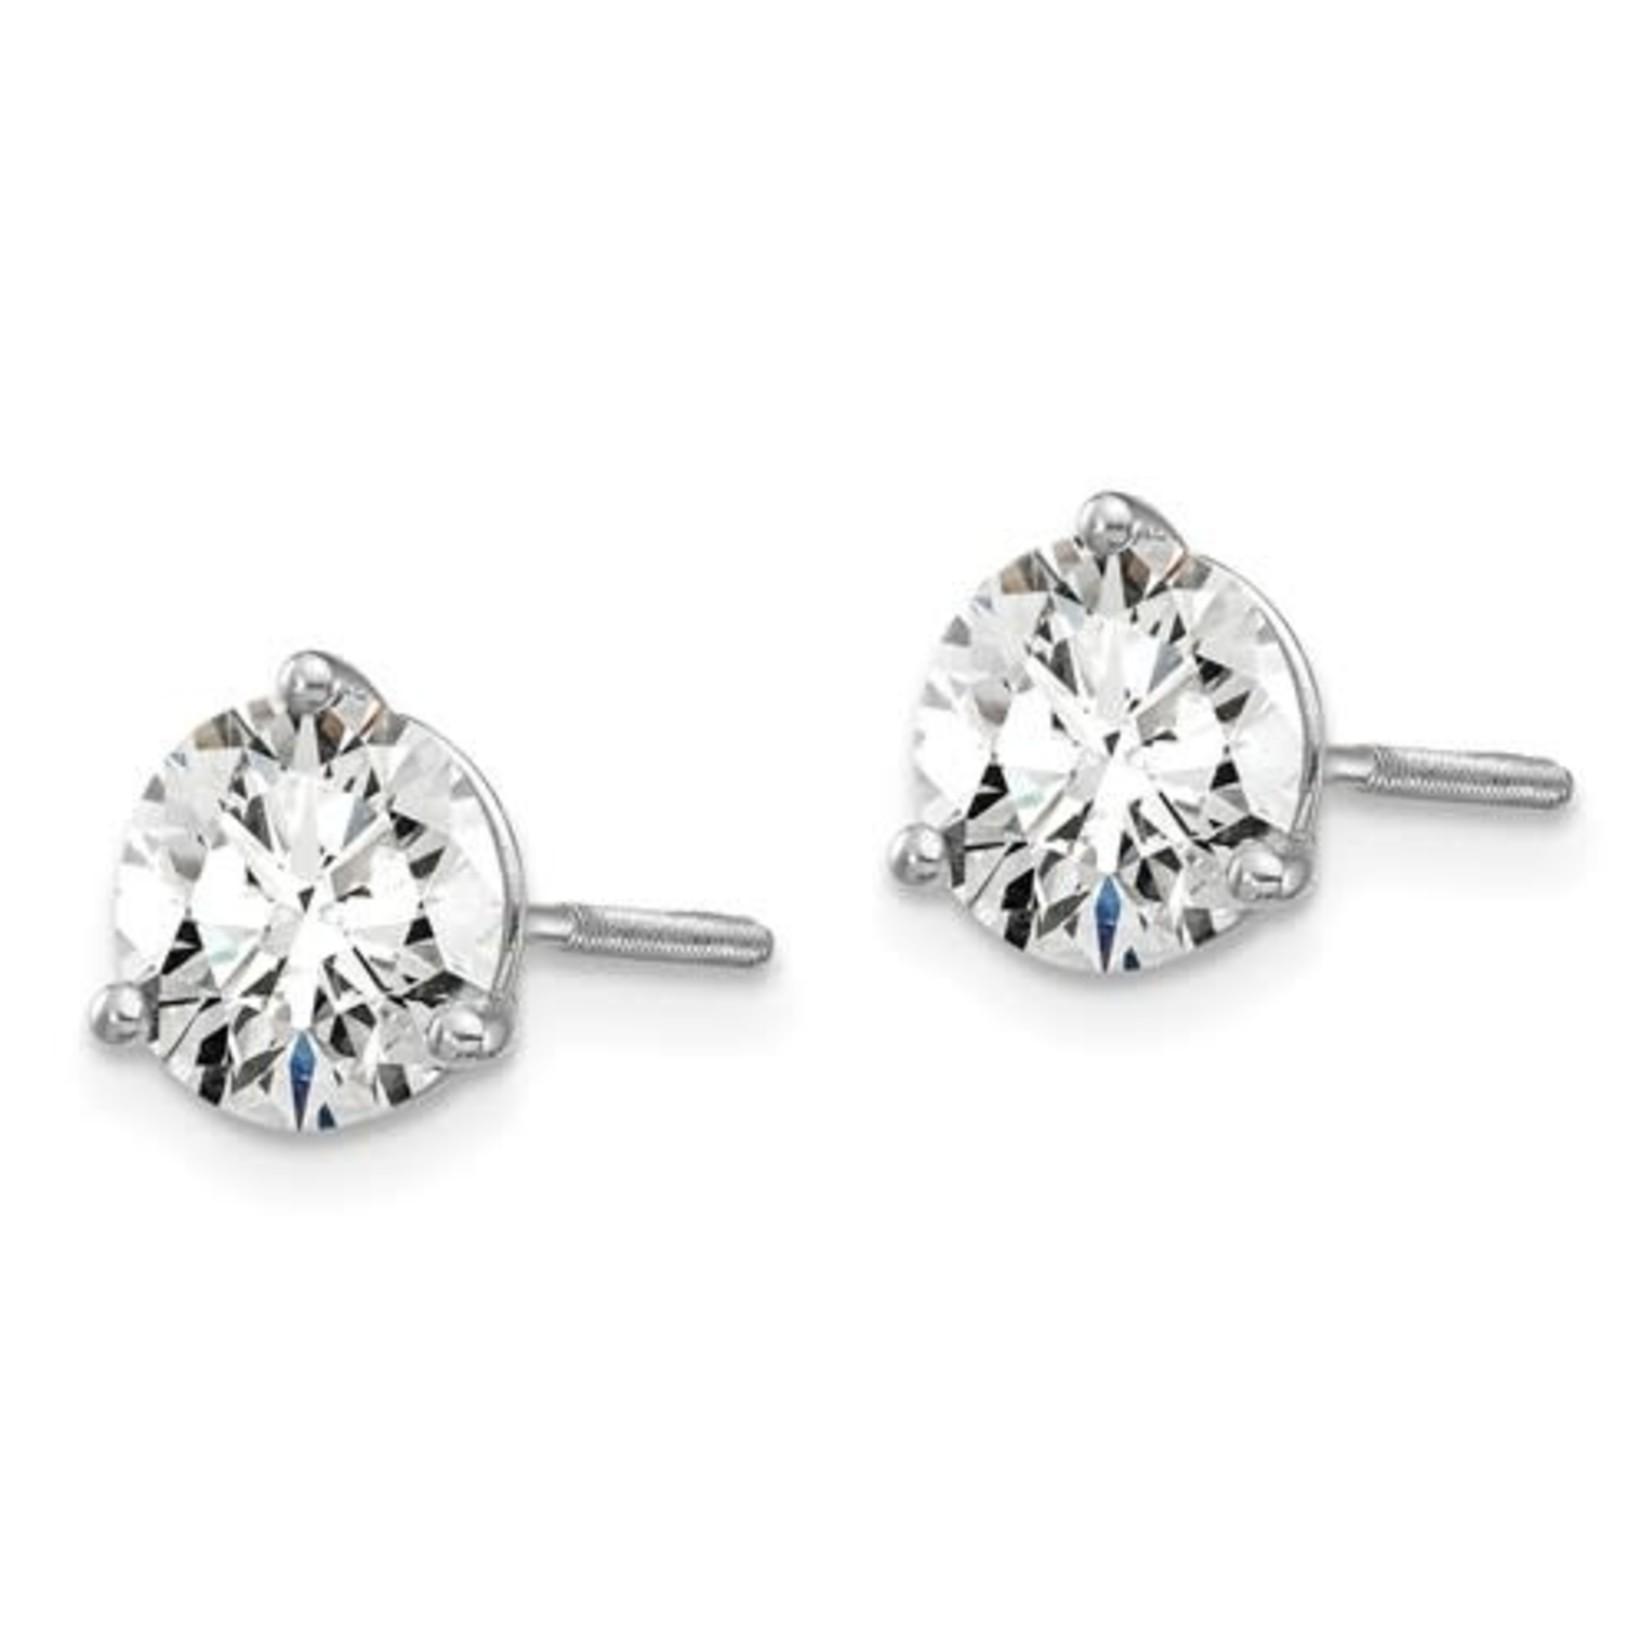 On The Edge Diamond Earrings - 1.50ctw